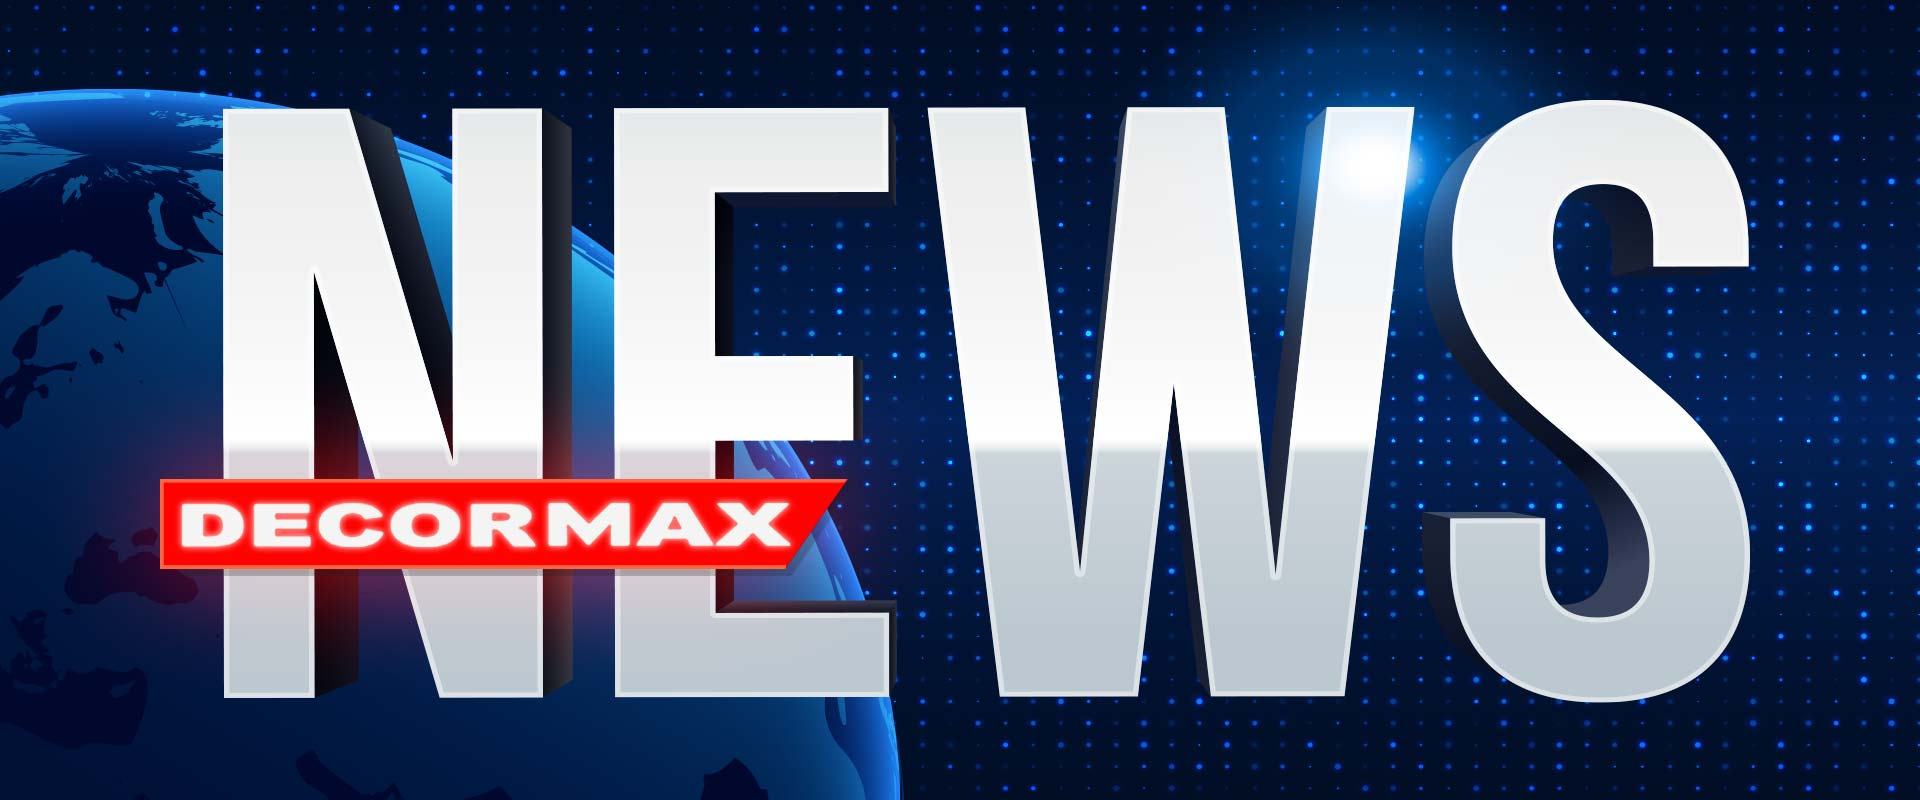 decormax news2